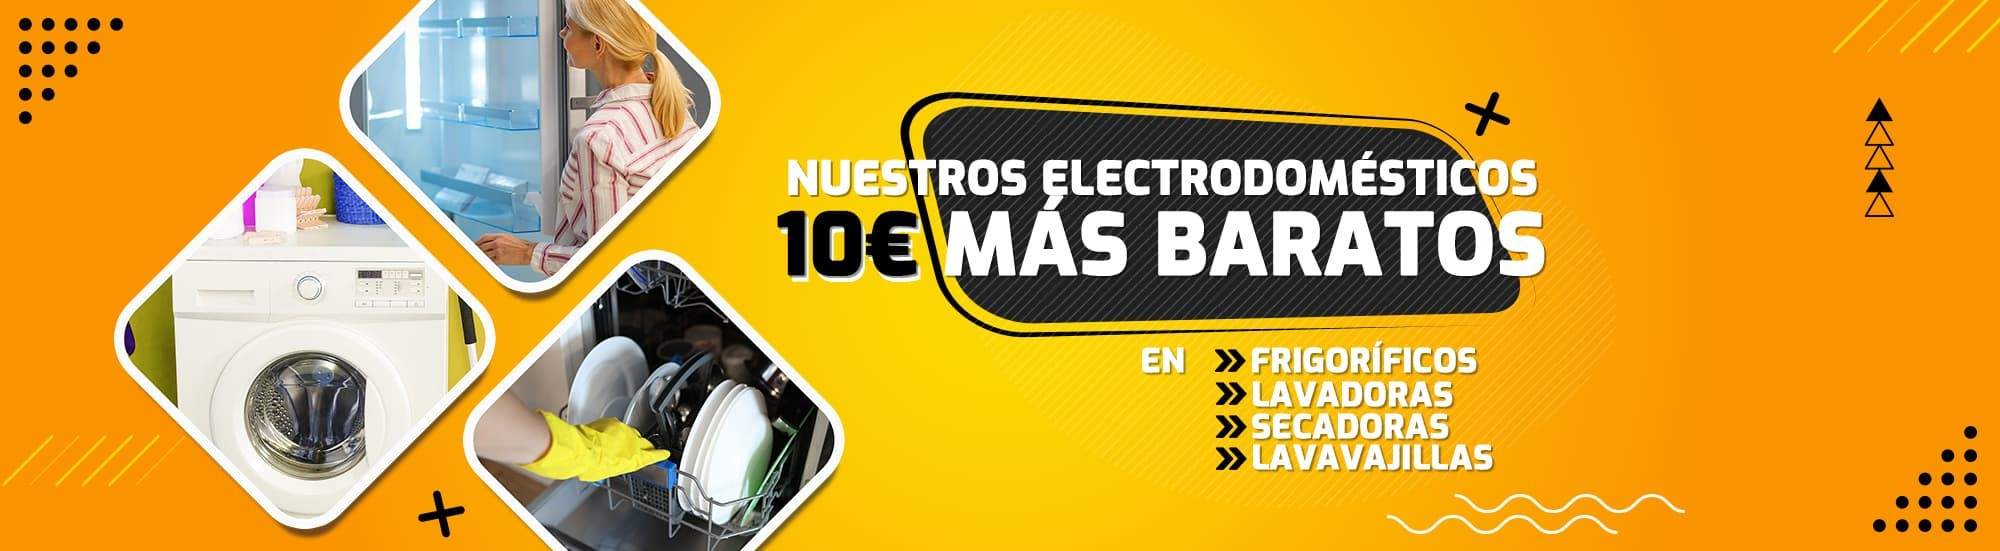 10 euros de descuento en grandes electrodomésticos